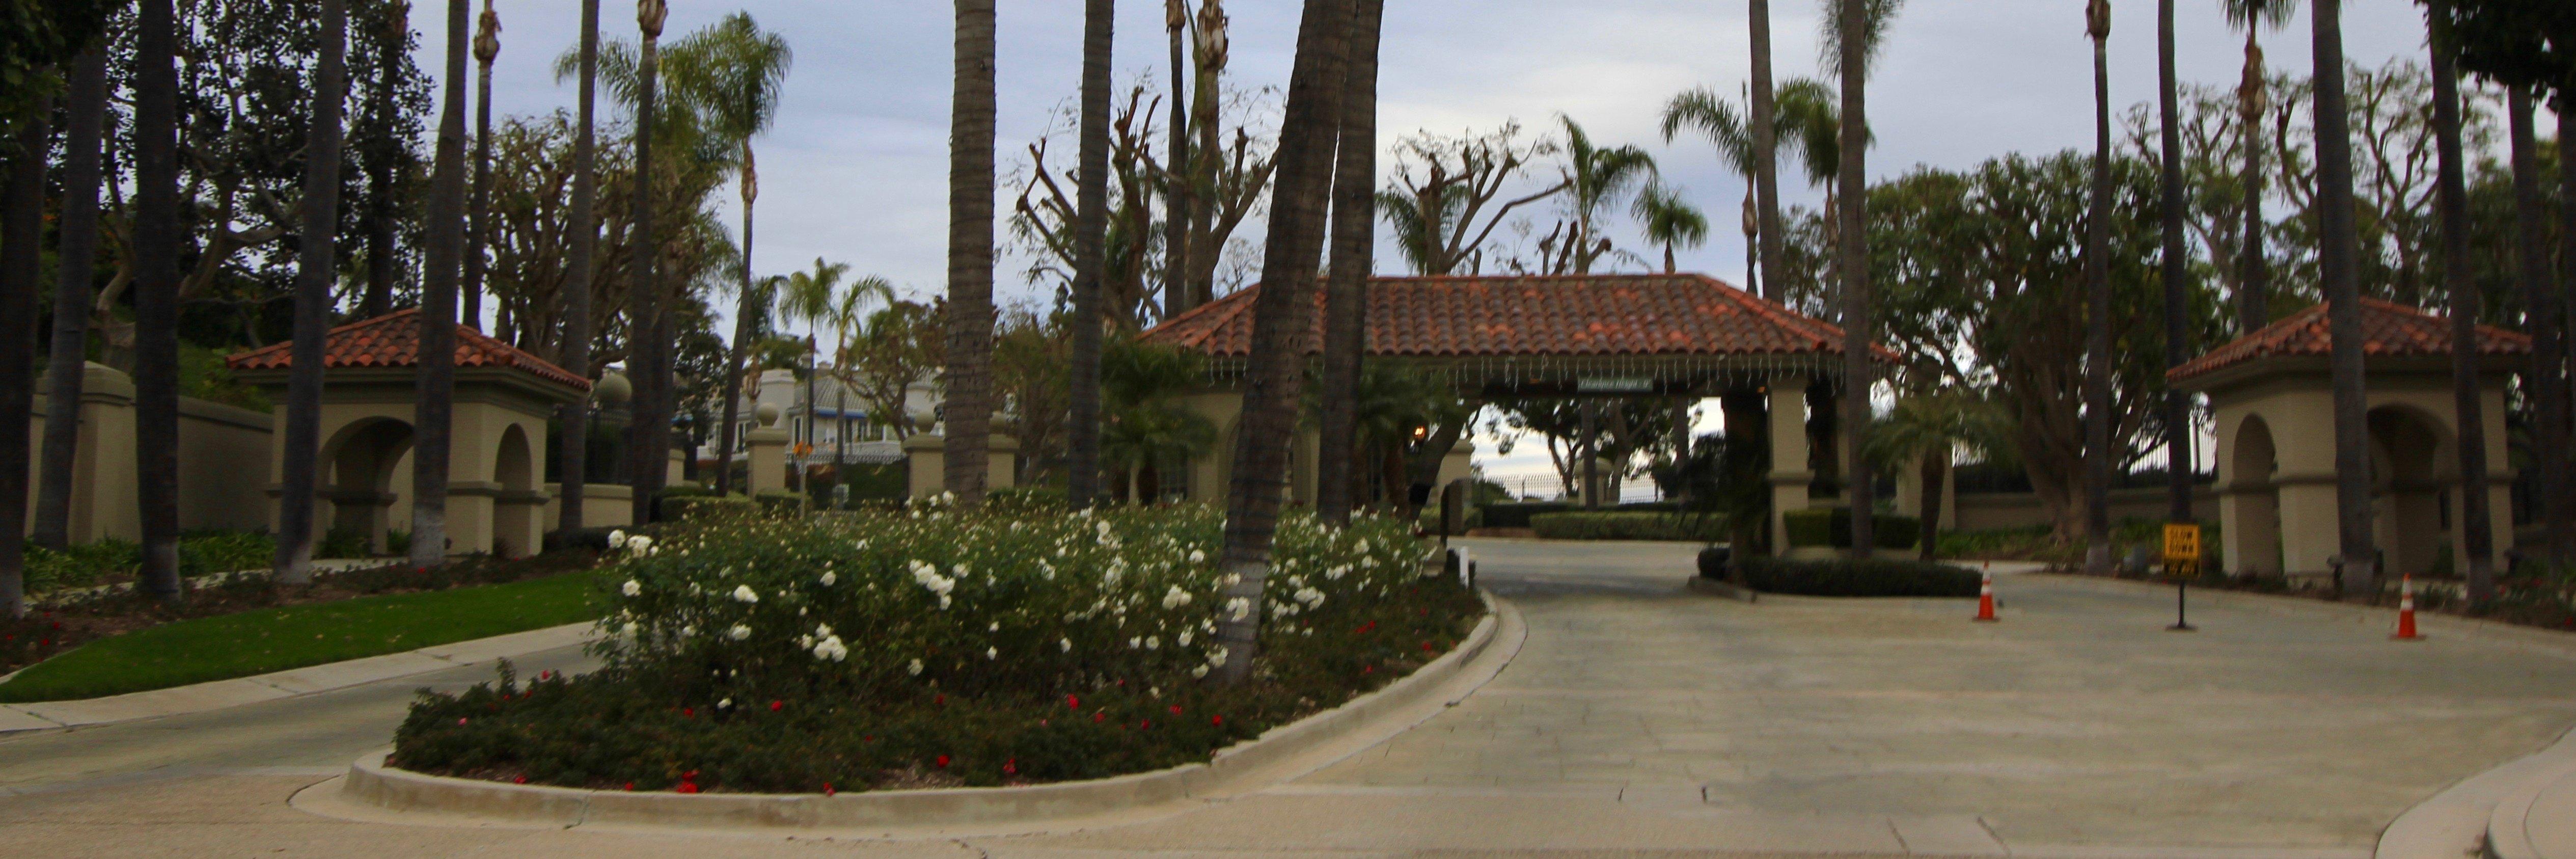 South Peak is a neighborhood of homes located in Laguna Niguel California